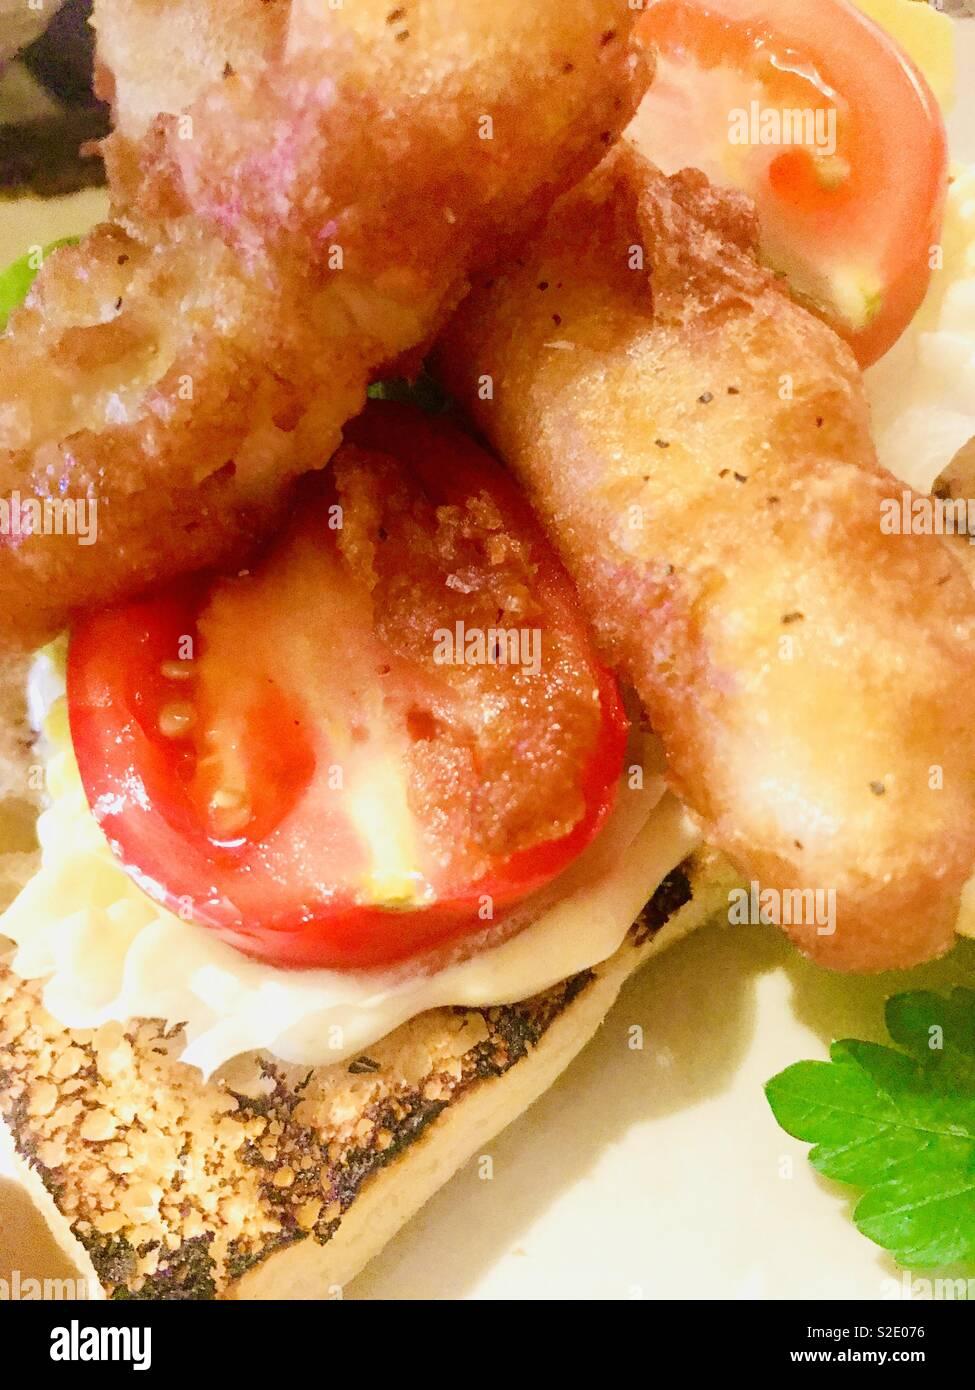 Posh fish finger sandwich with tomato - Stock Image